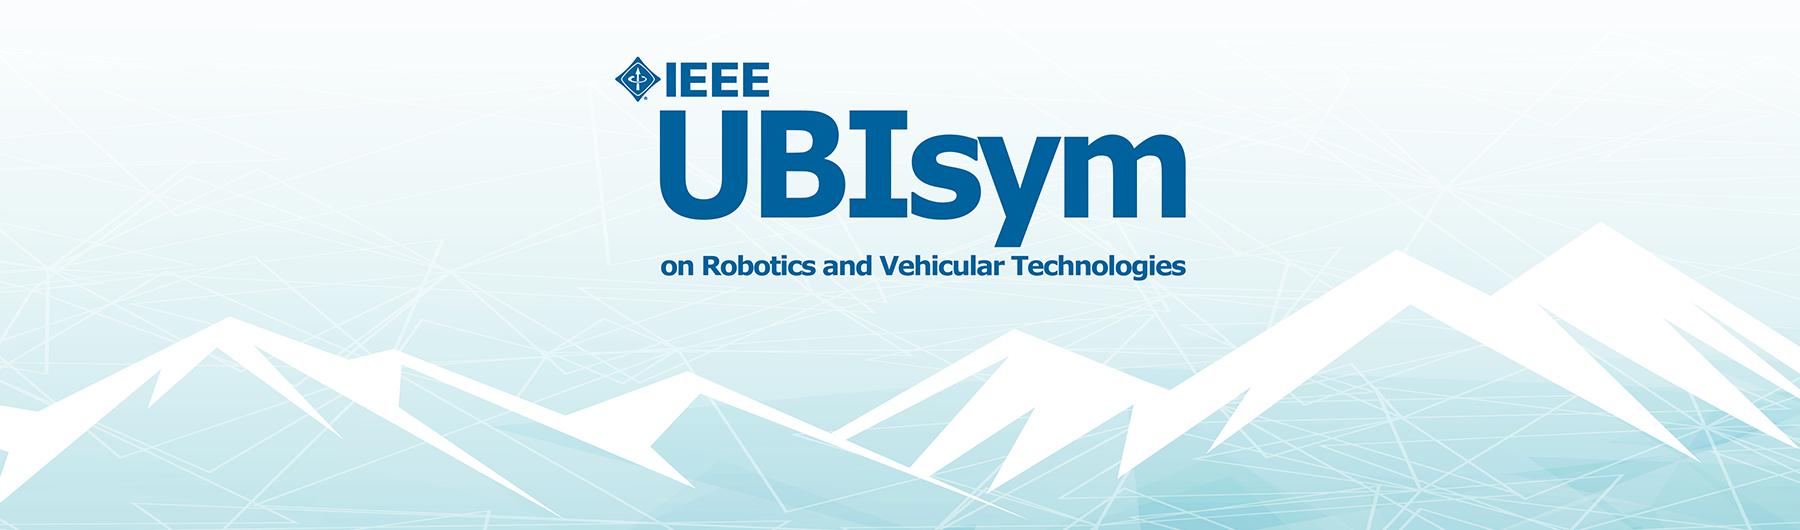 UBIsym on Robotics and Vehicular Technologies